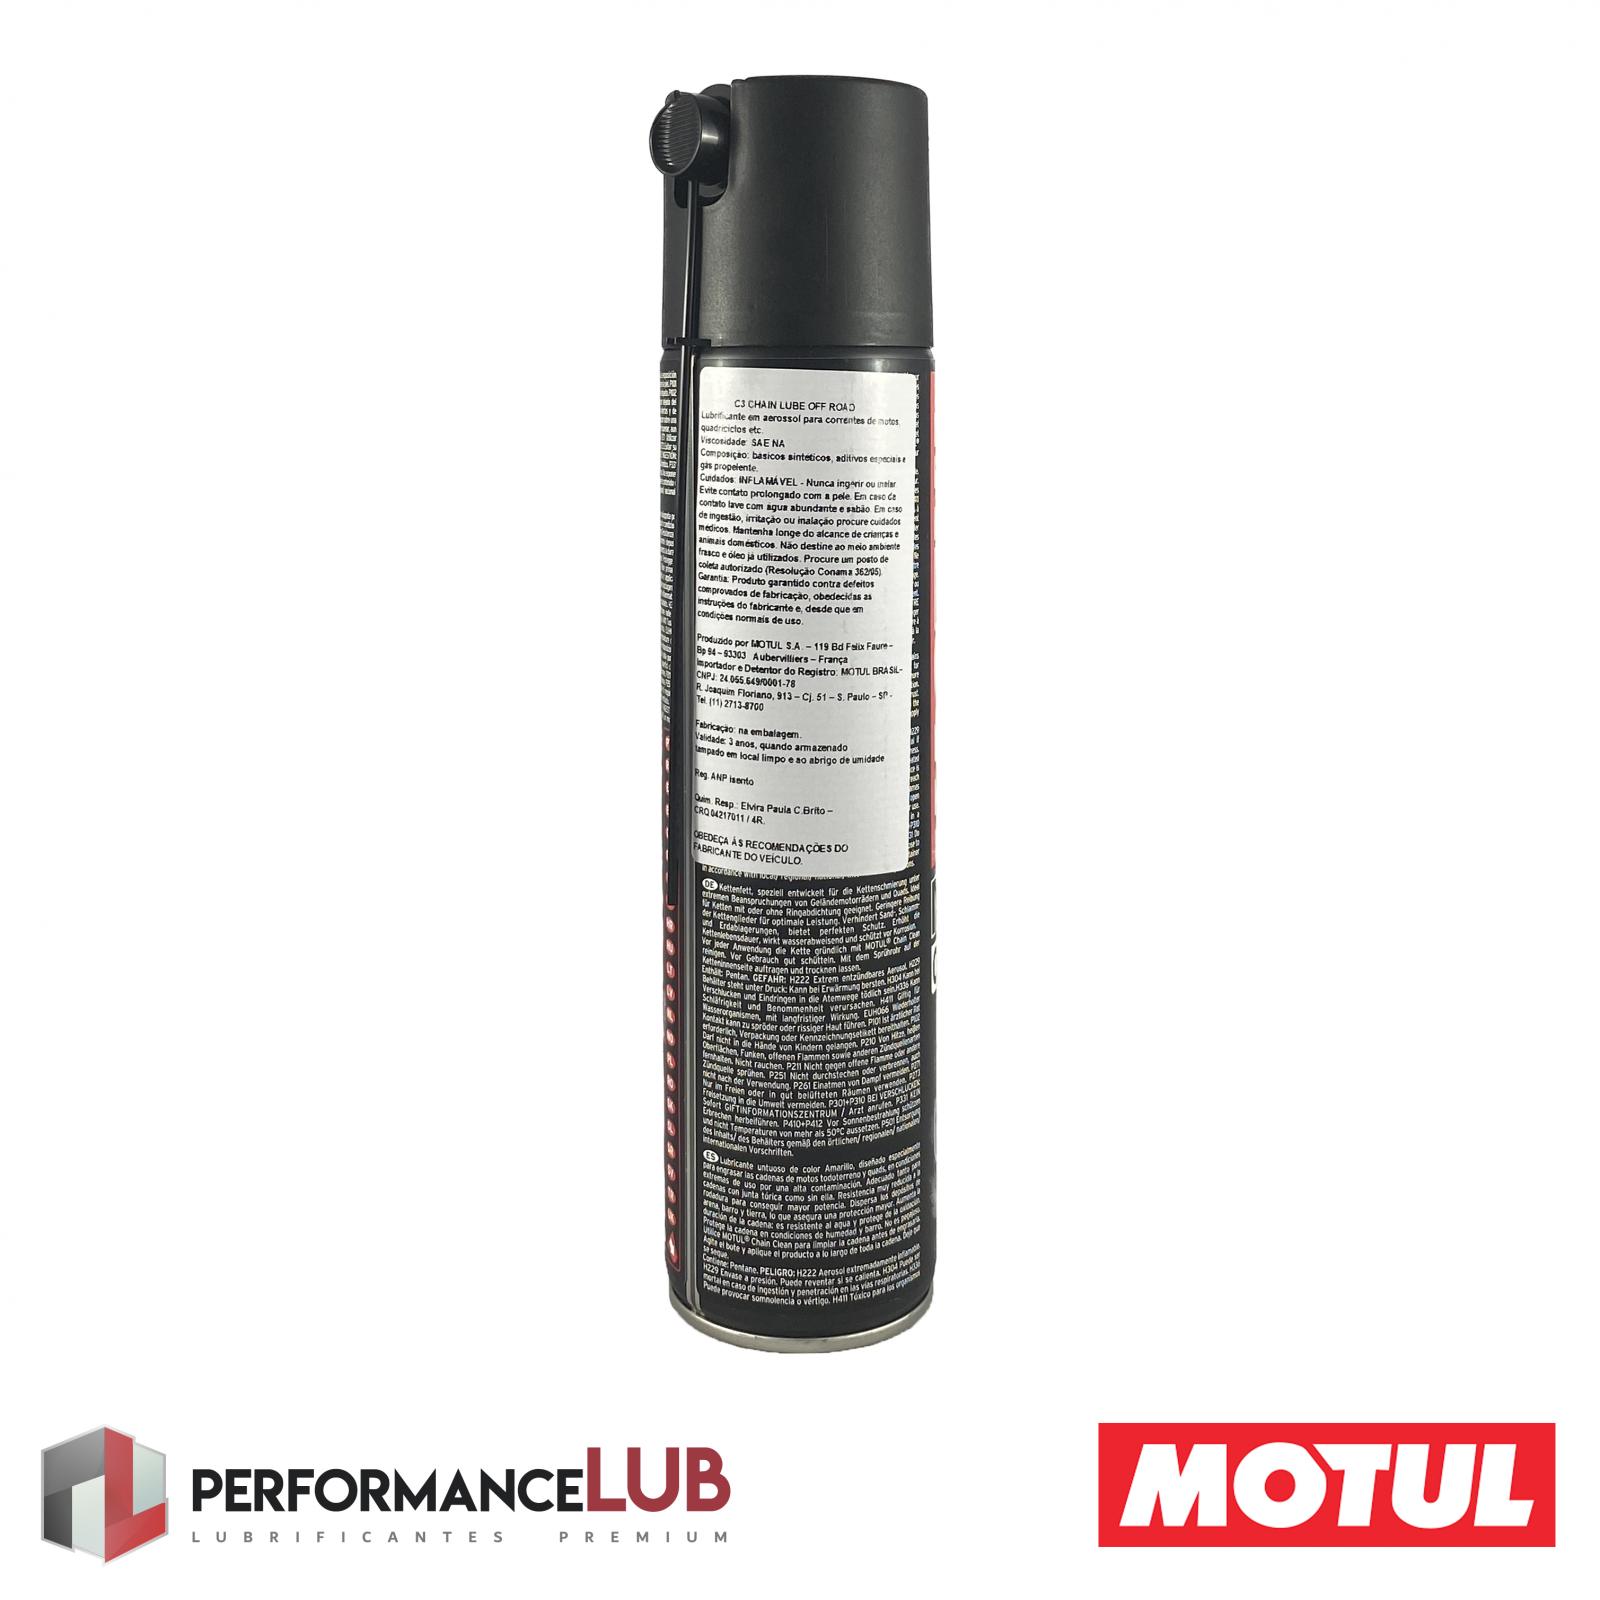 C3 Chain Lube Off Road - 400 ml - PerformanceLUB Lubrificantes Premium